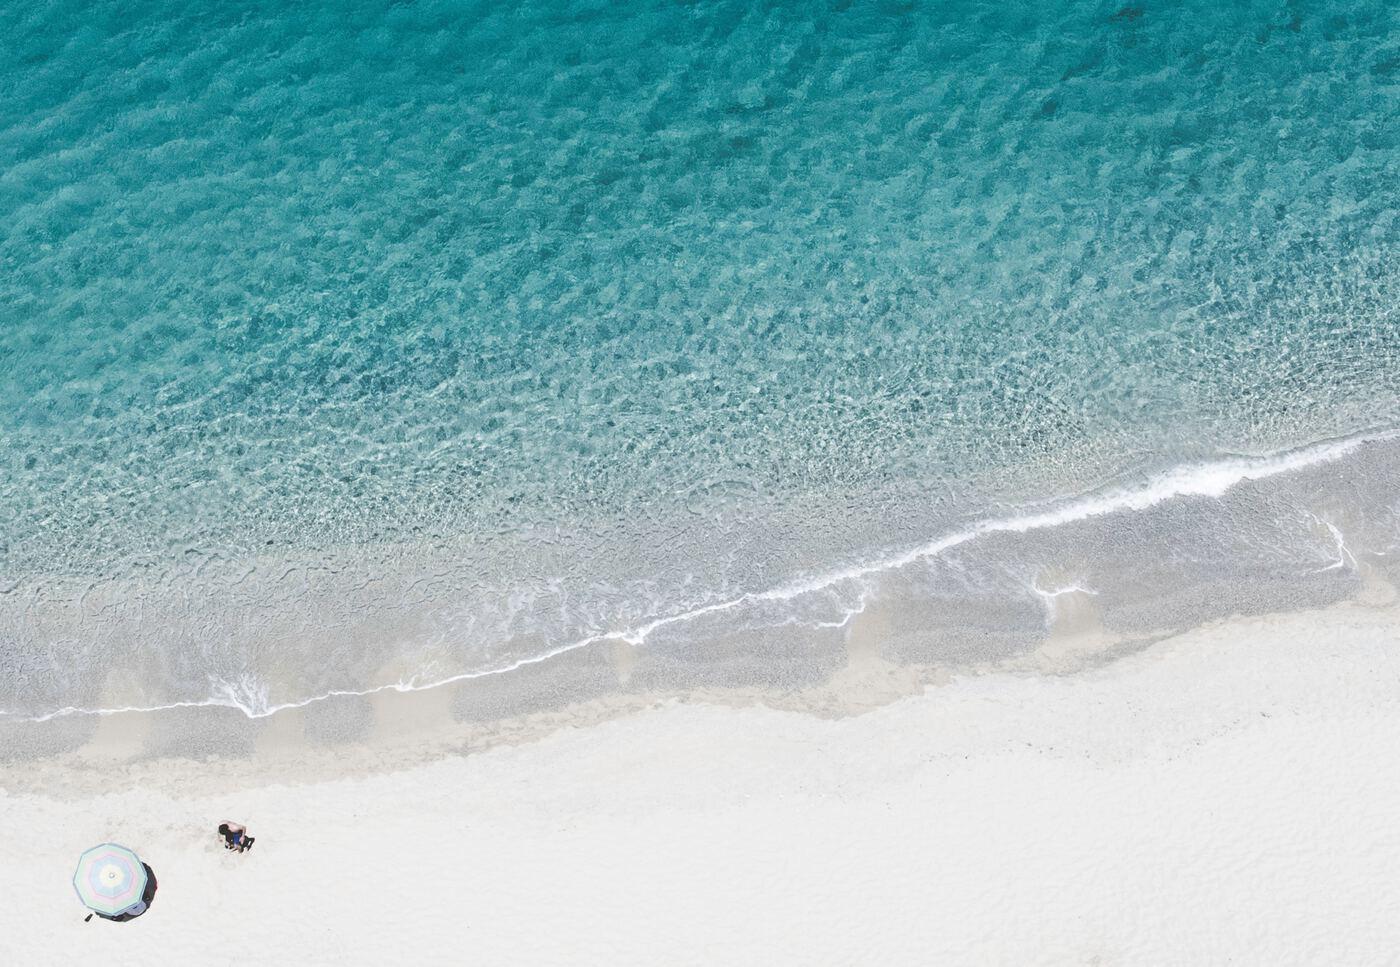 Spiaggia Di Tropea, feiner Sandstrand in Kalabrien